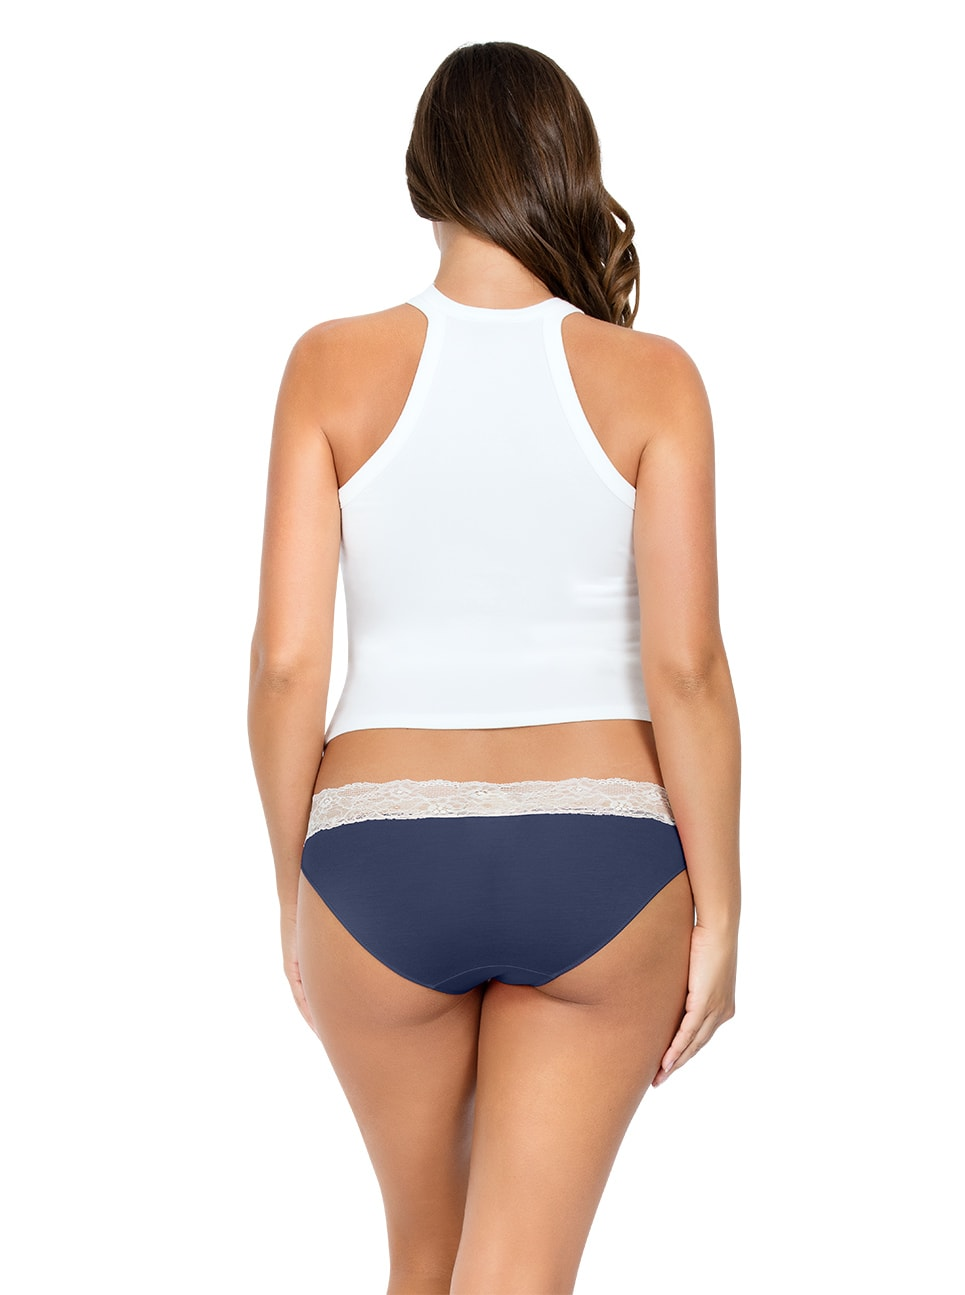 PARFAIT ParfaitPanty SoEssential BikiniPP303 NavyBlue Back - Parfait Panty So Essential Bikini- Navy - PP303